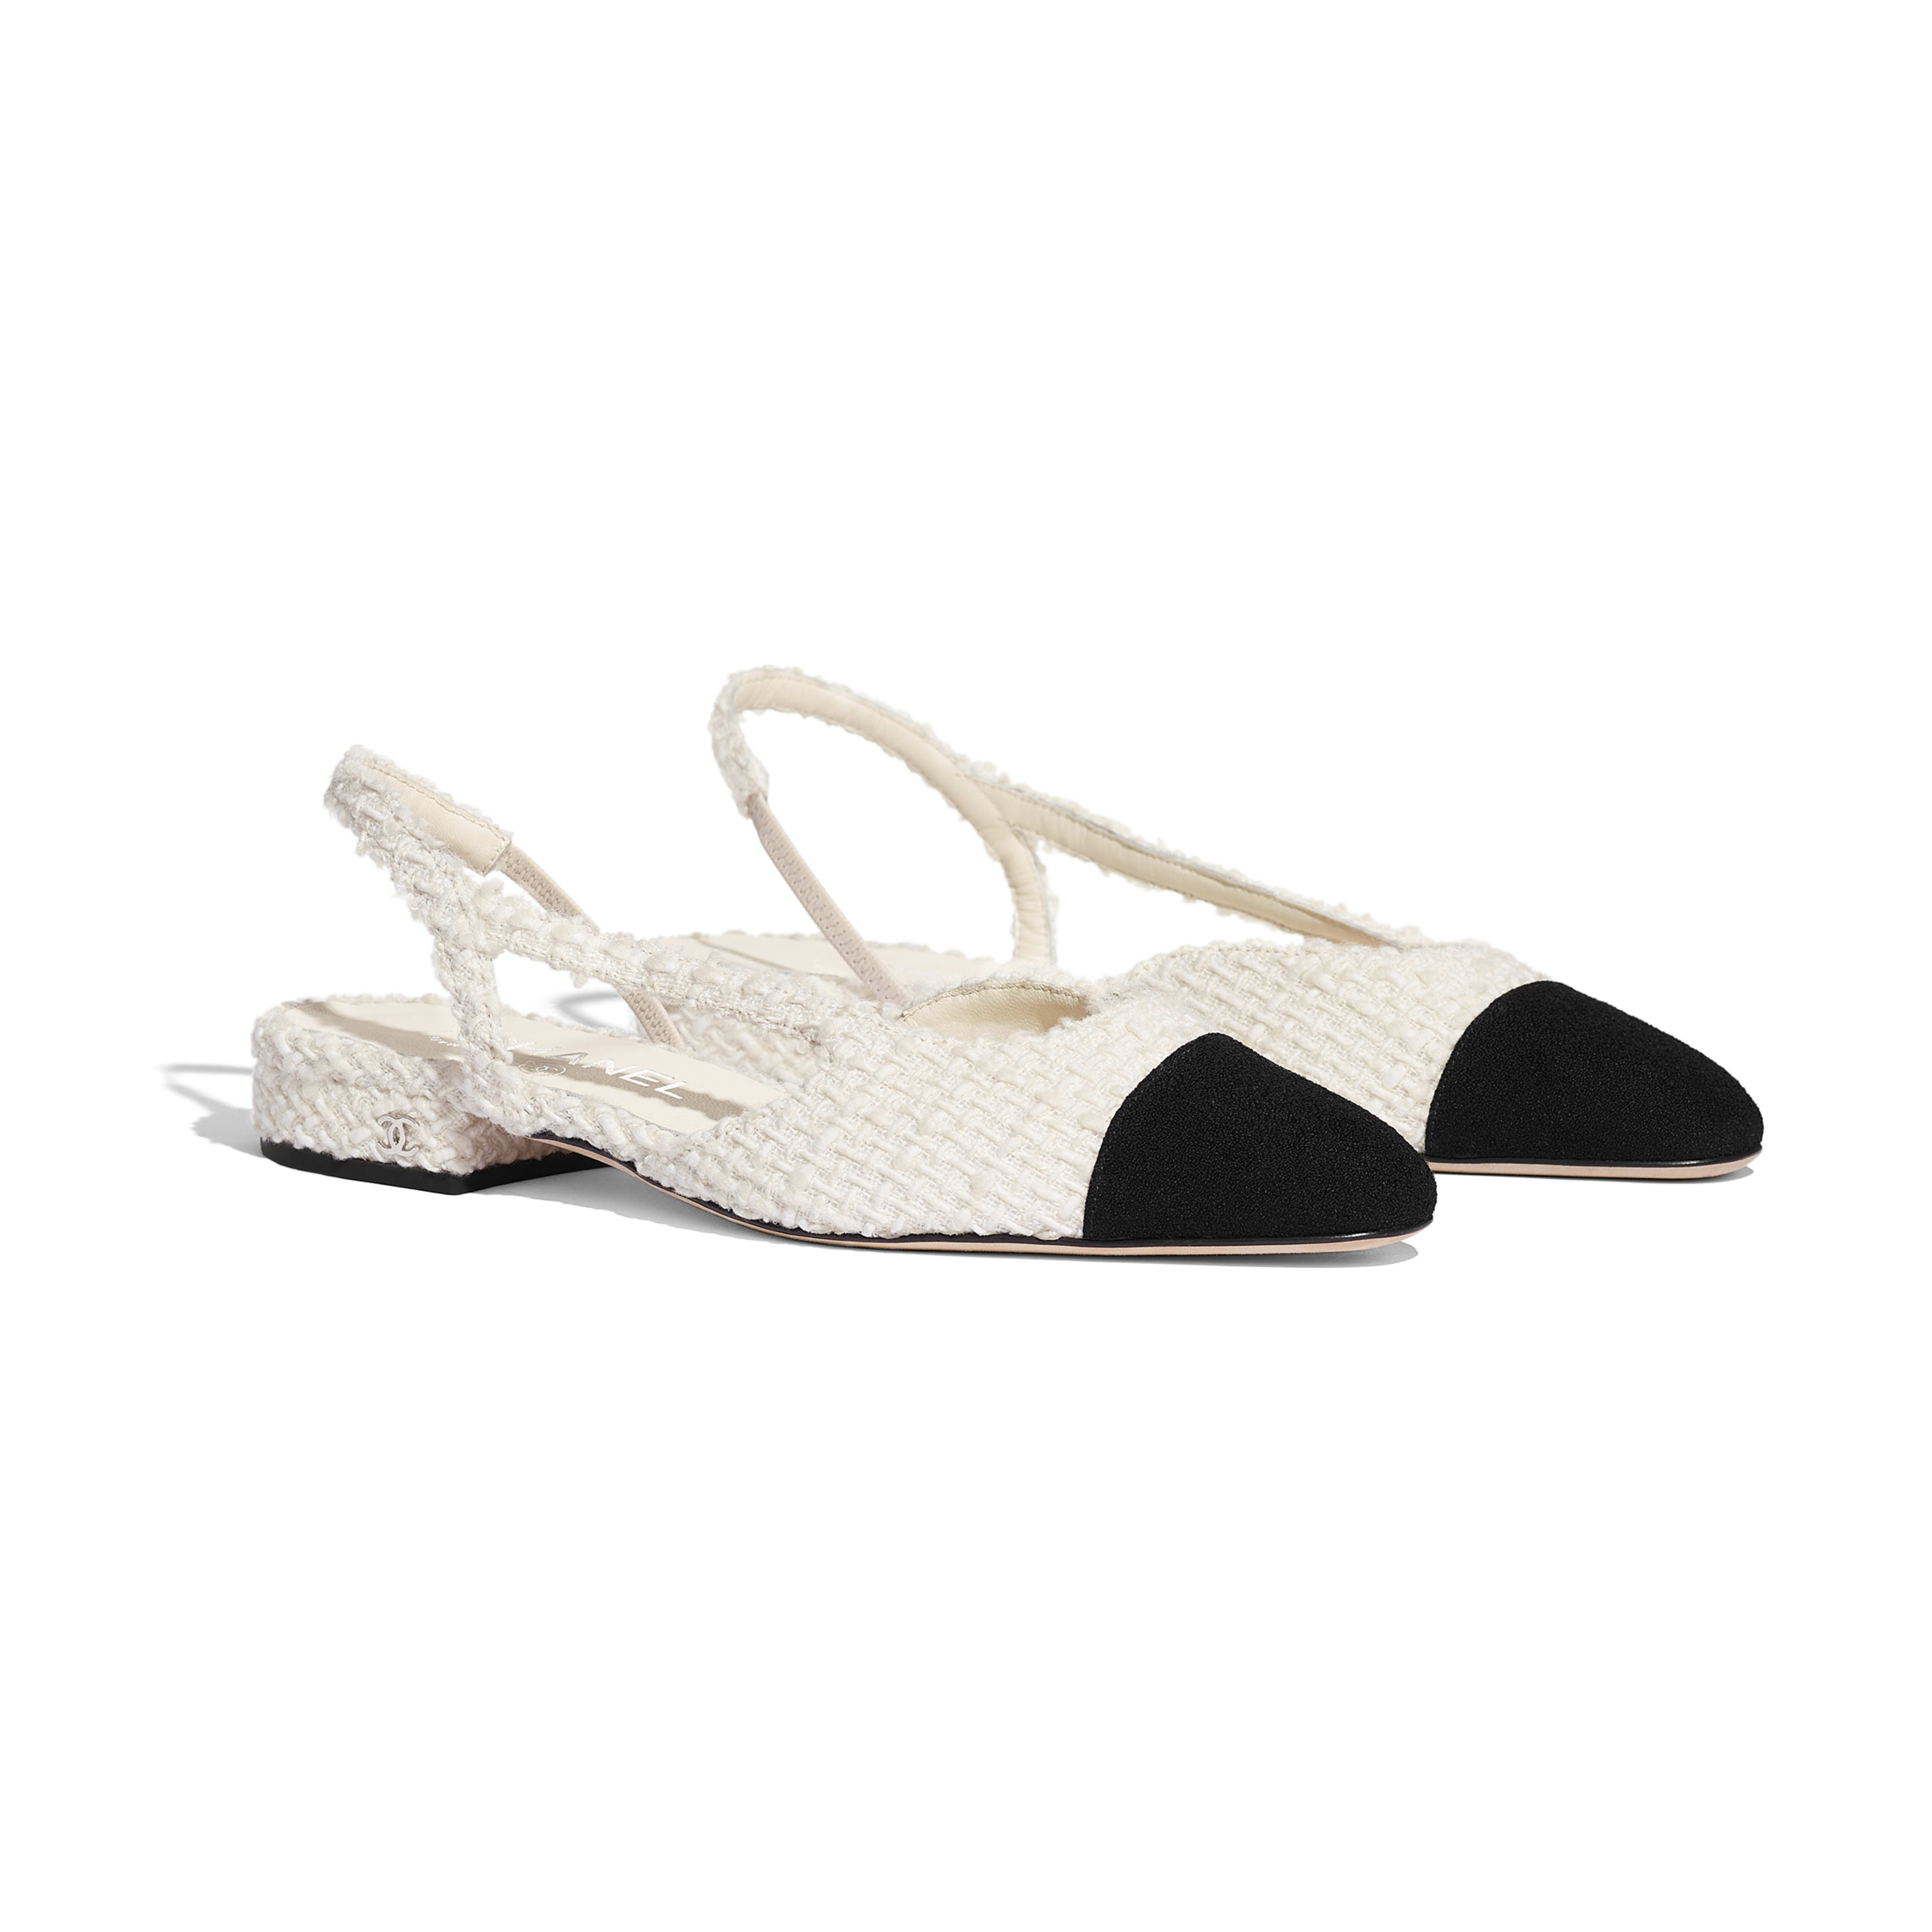 Sling-Back - White & Black - Wool Tweed - Alternative view - see full sized version